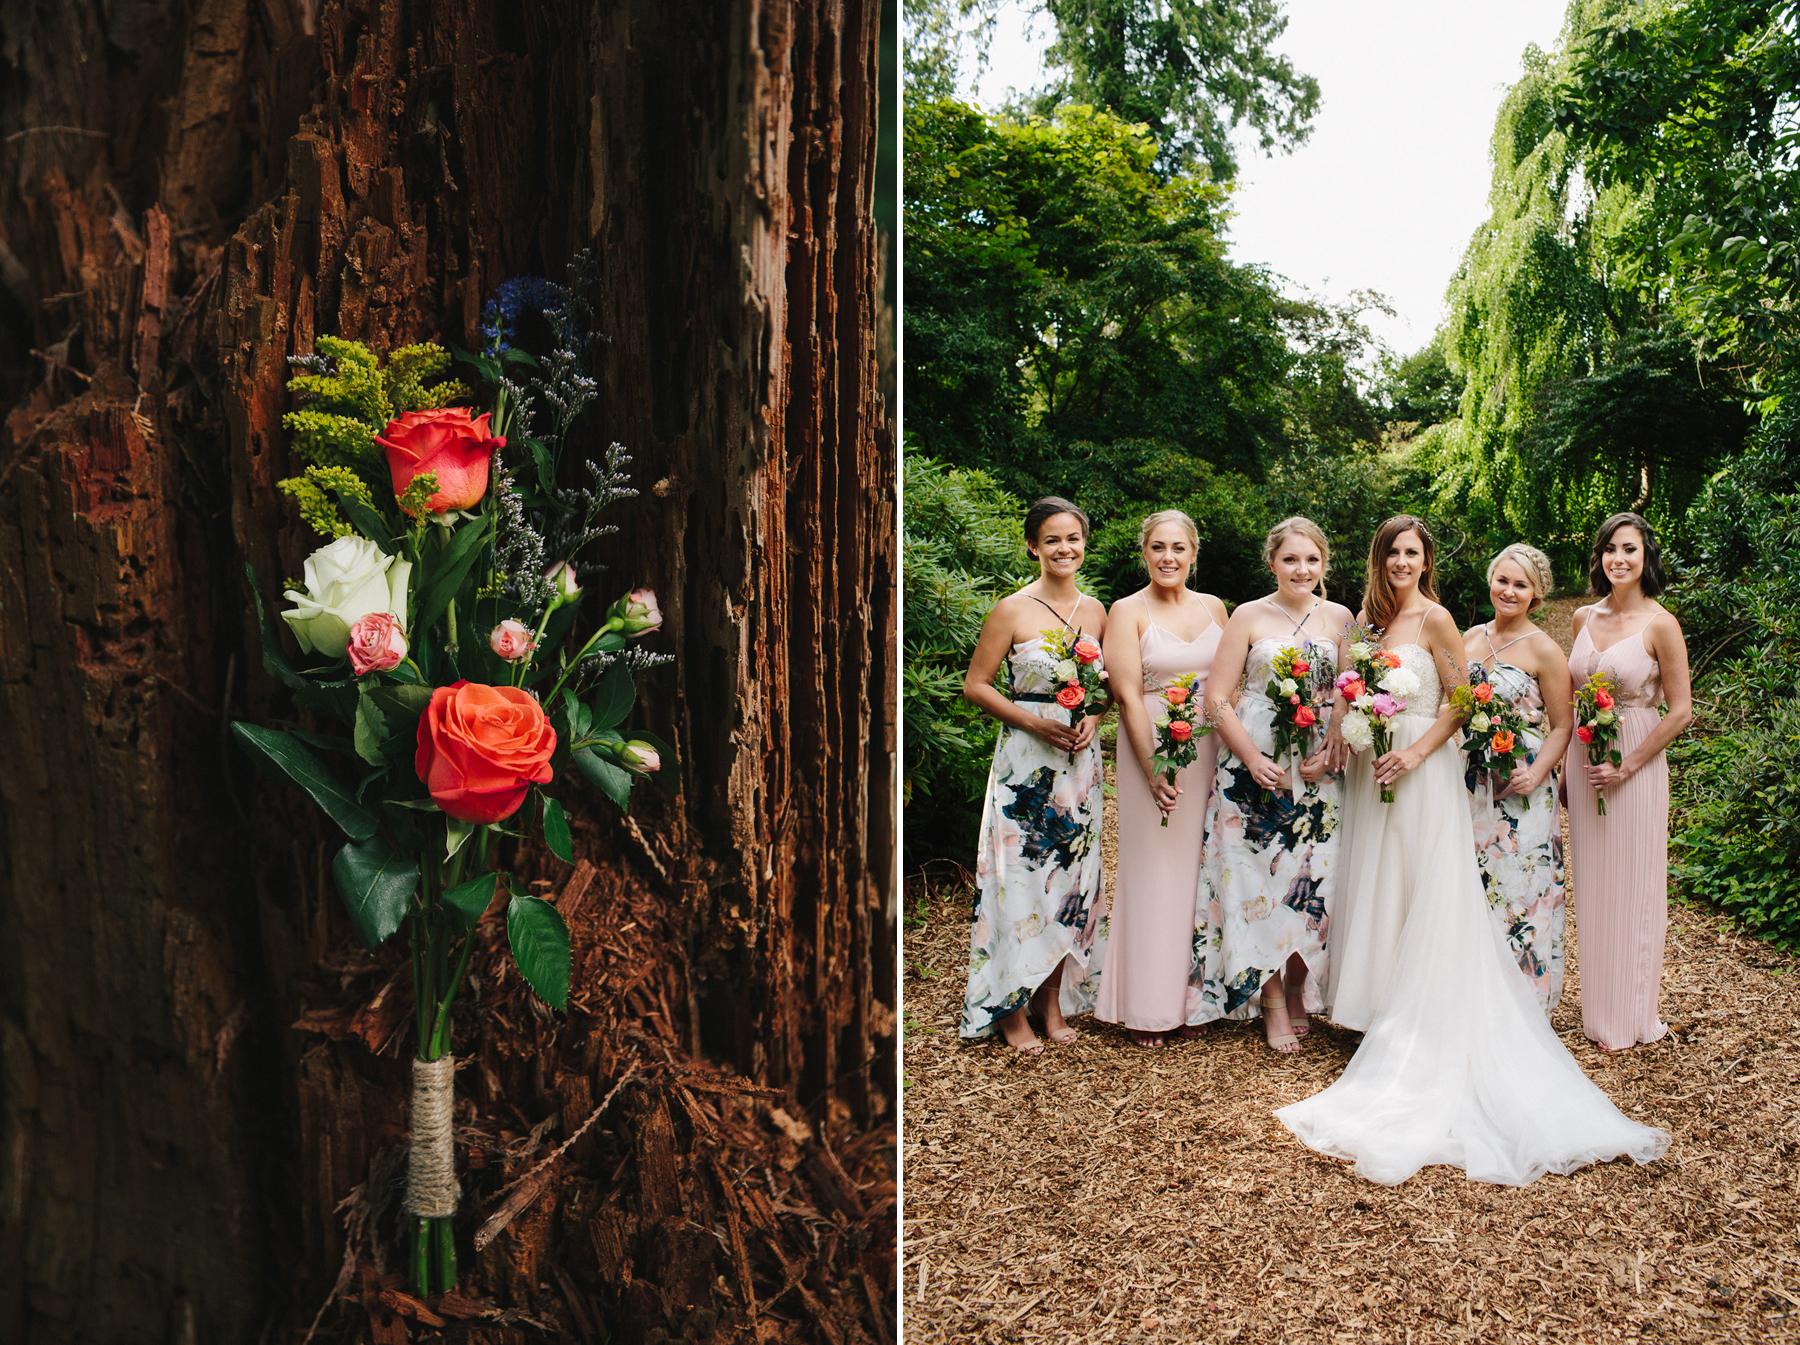 UBC-Botanical-Garden-Wedding-AD-054.jpg